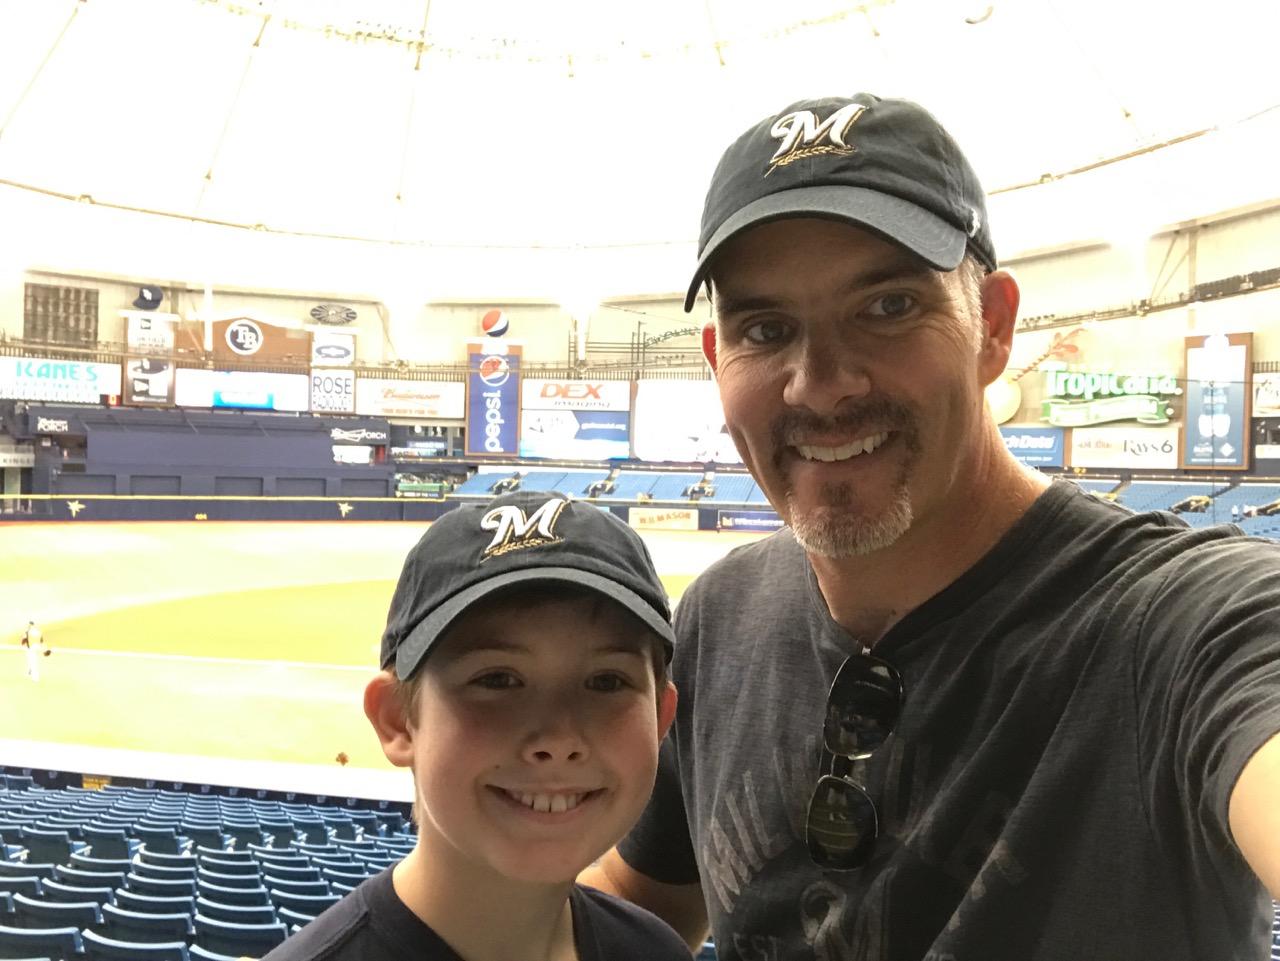 Tropicana Field - Rays vs. Brewers